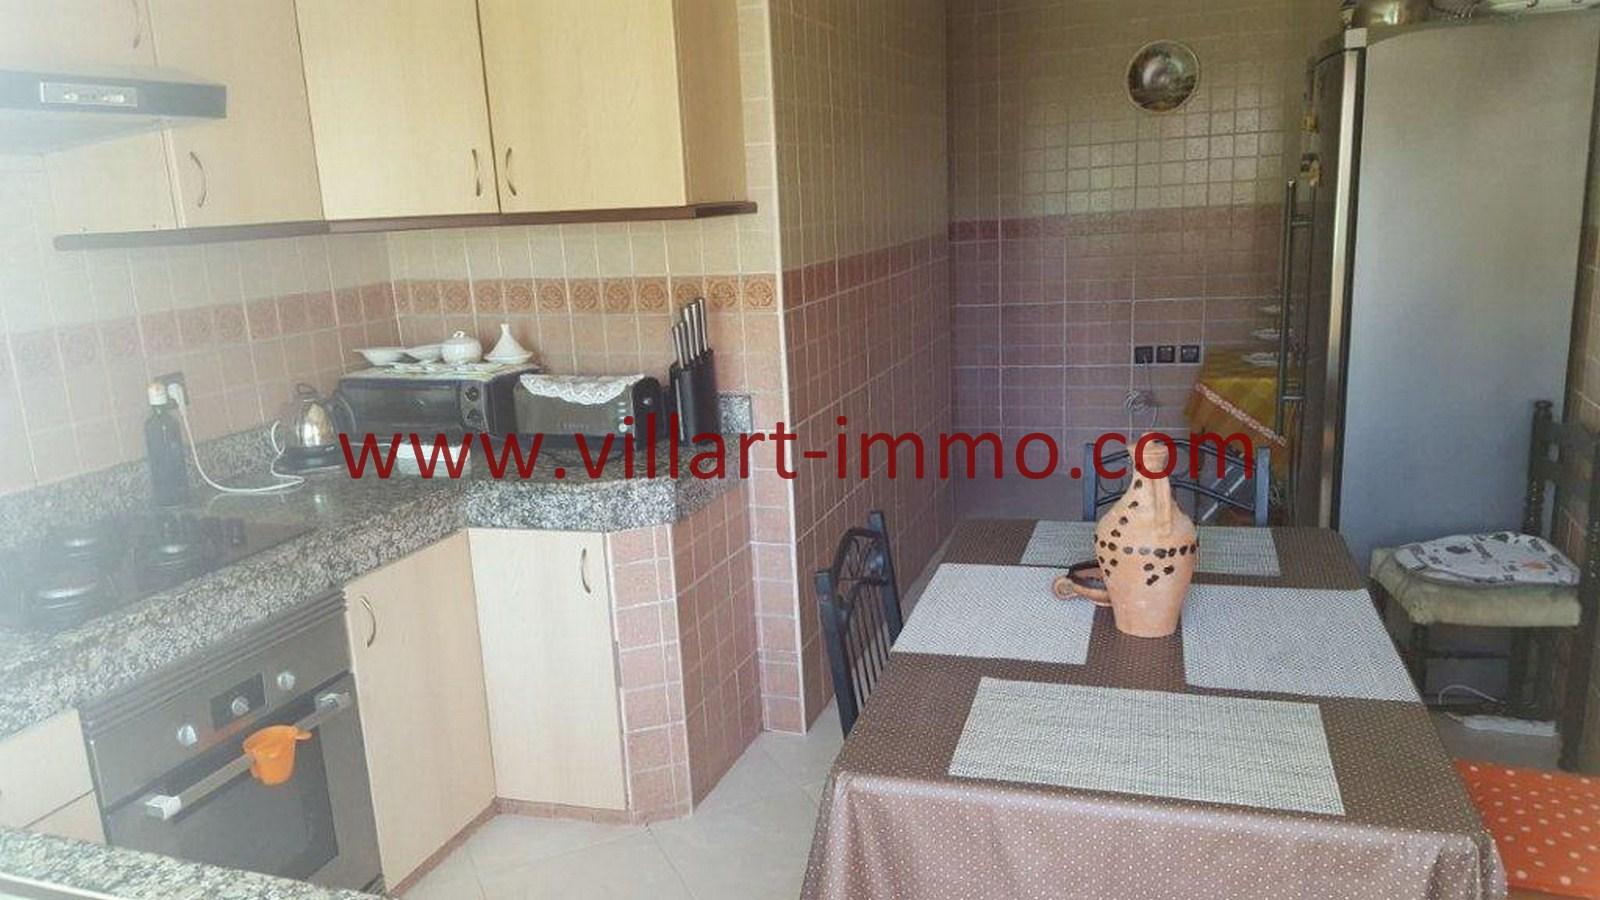 7-Vente-Appartement-Tanger-Cuisine -VA523-Centre ville -Villart Immo